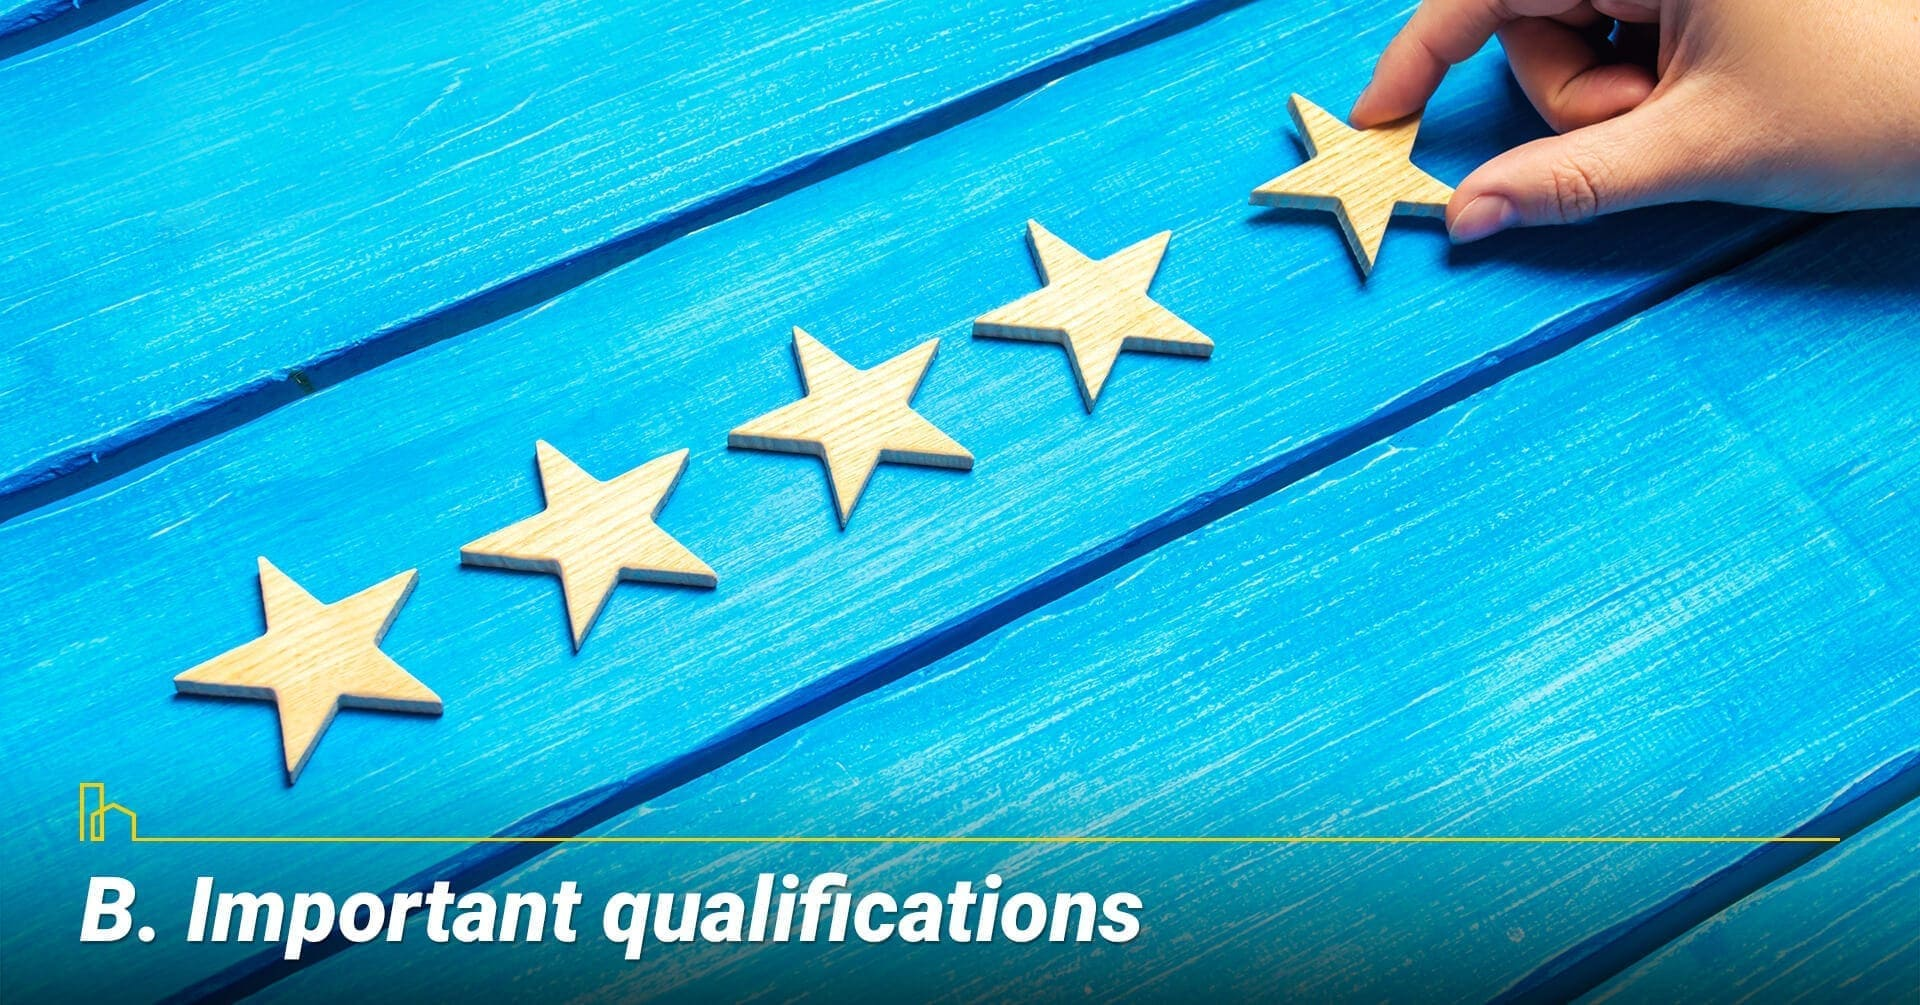 Important qualifications